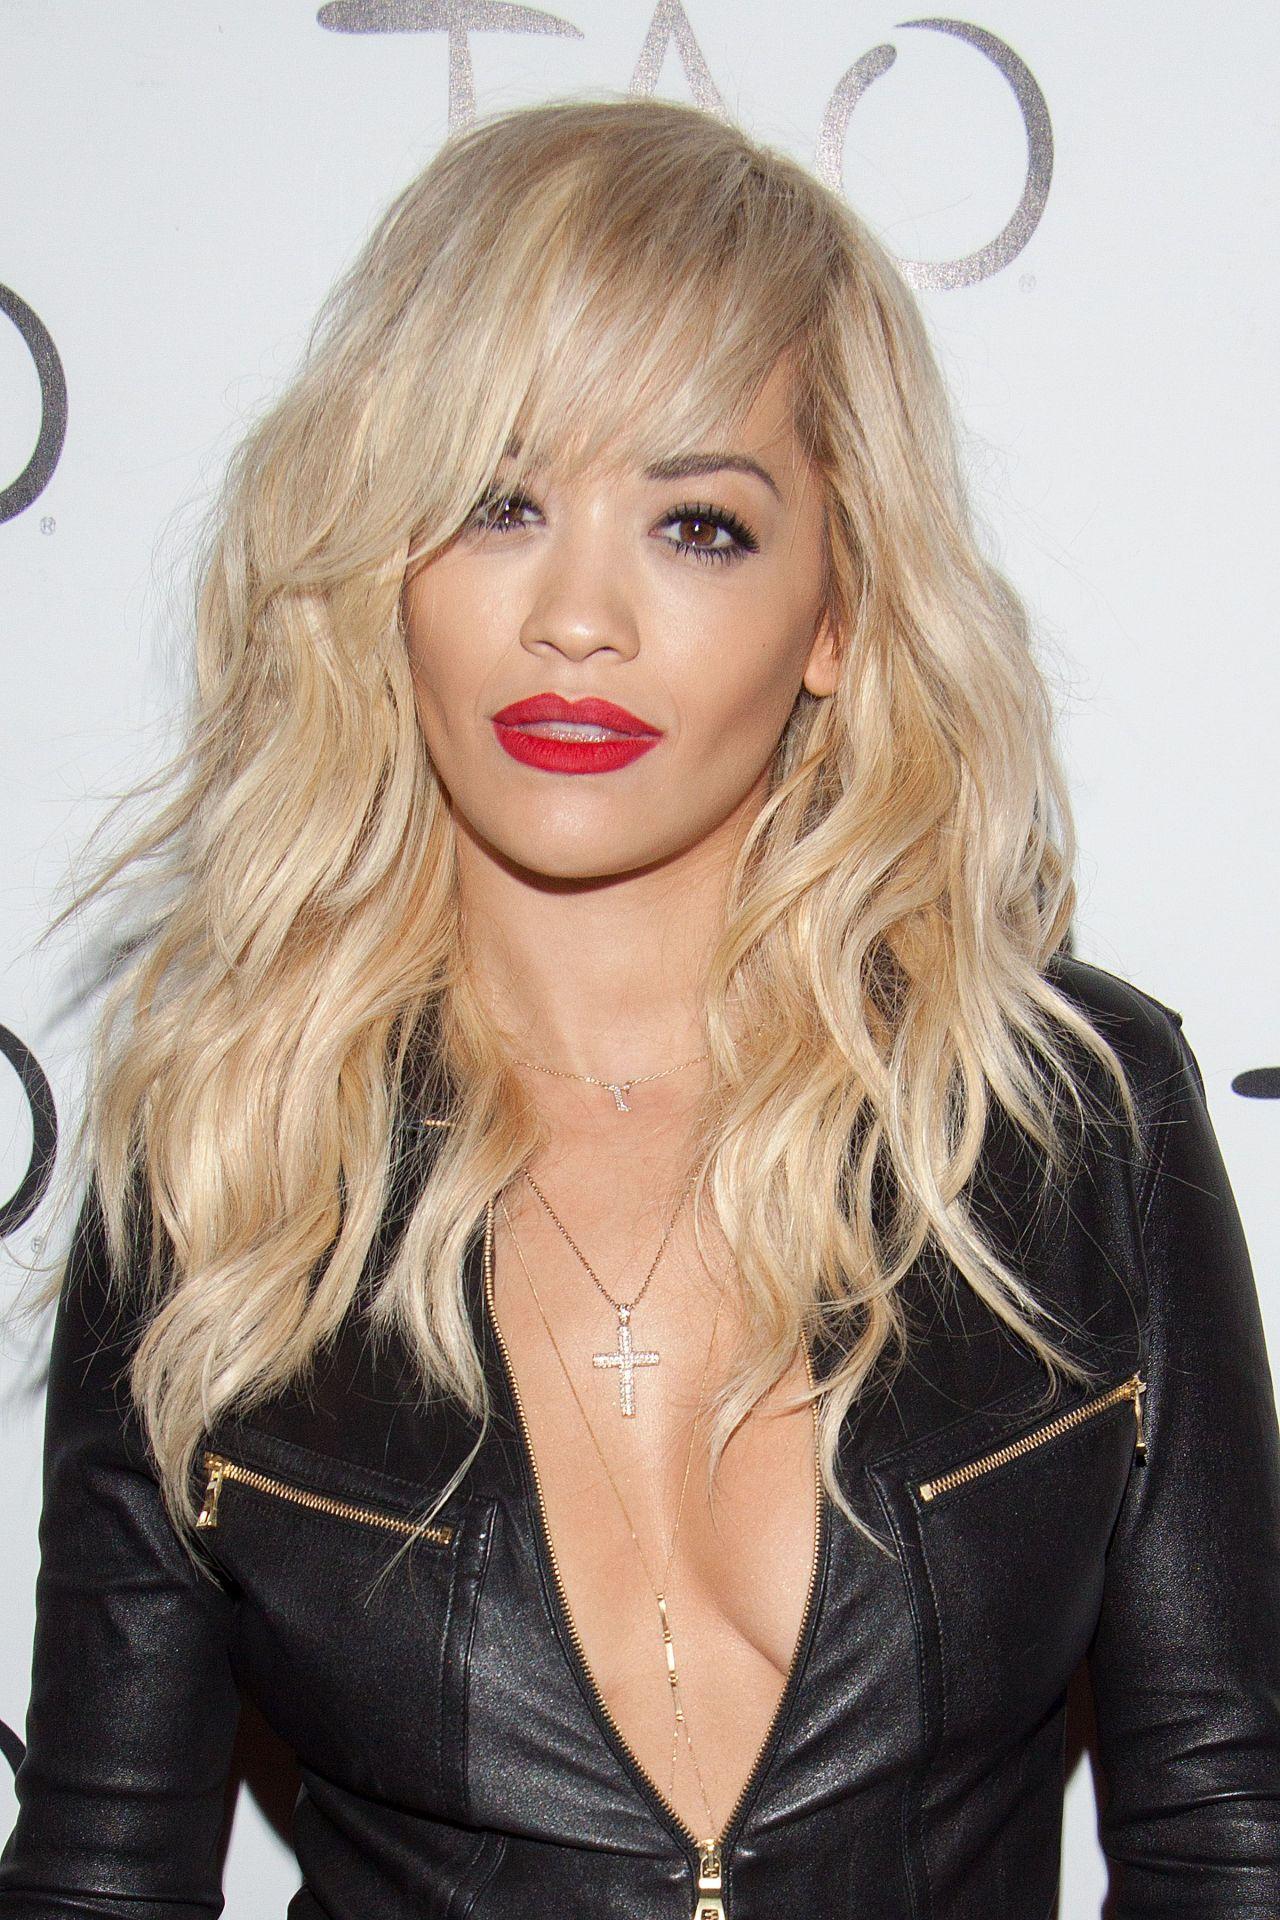 Rita Ora Night Out Style - TAO Nightclub in Las Vegas - July 2014